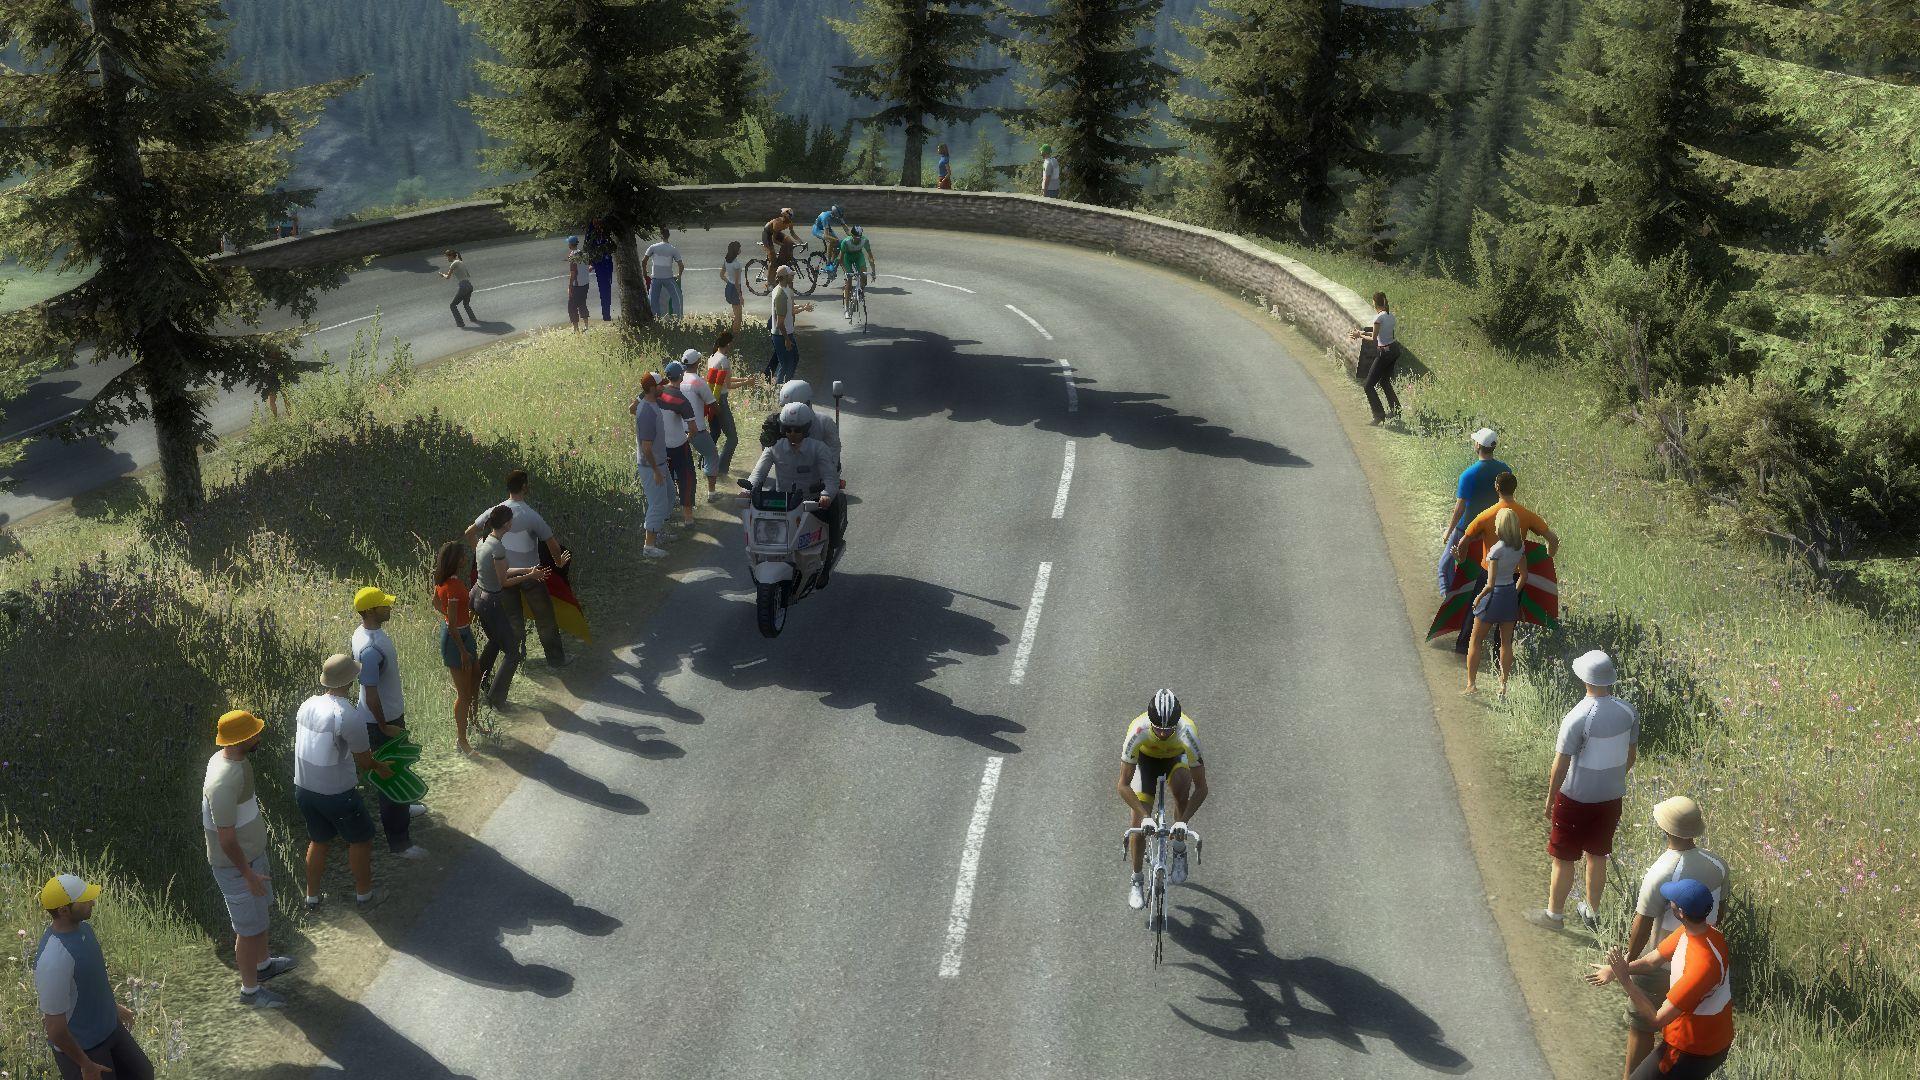 pcmdaily.com/images/mg/2017/Races/U23/Avenir/AVES7%2020.jpg